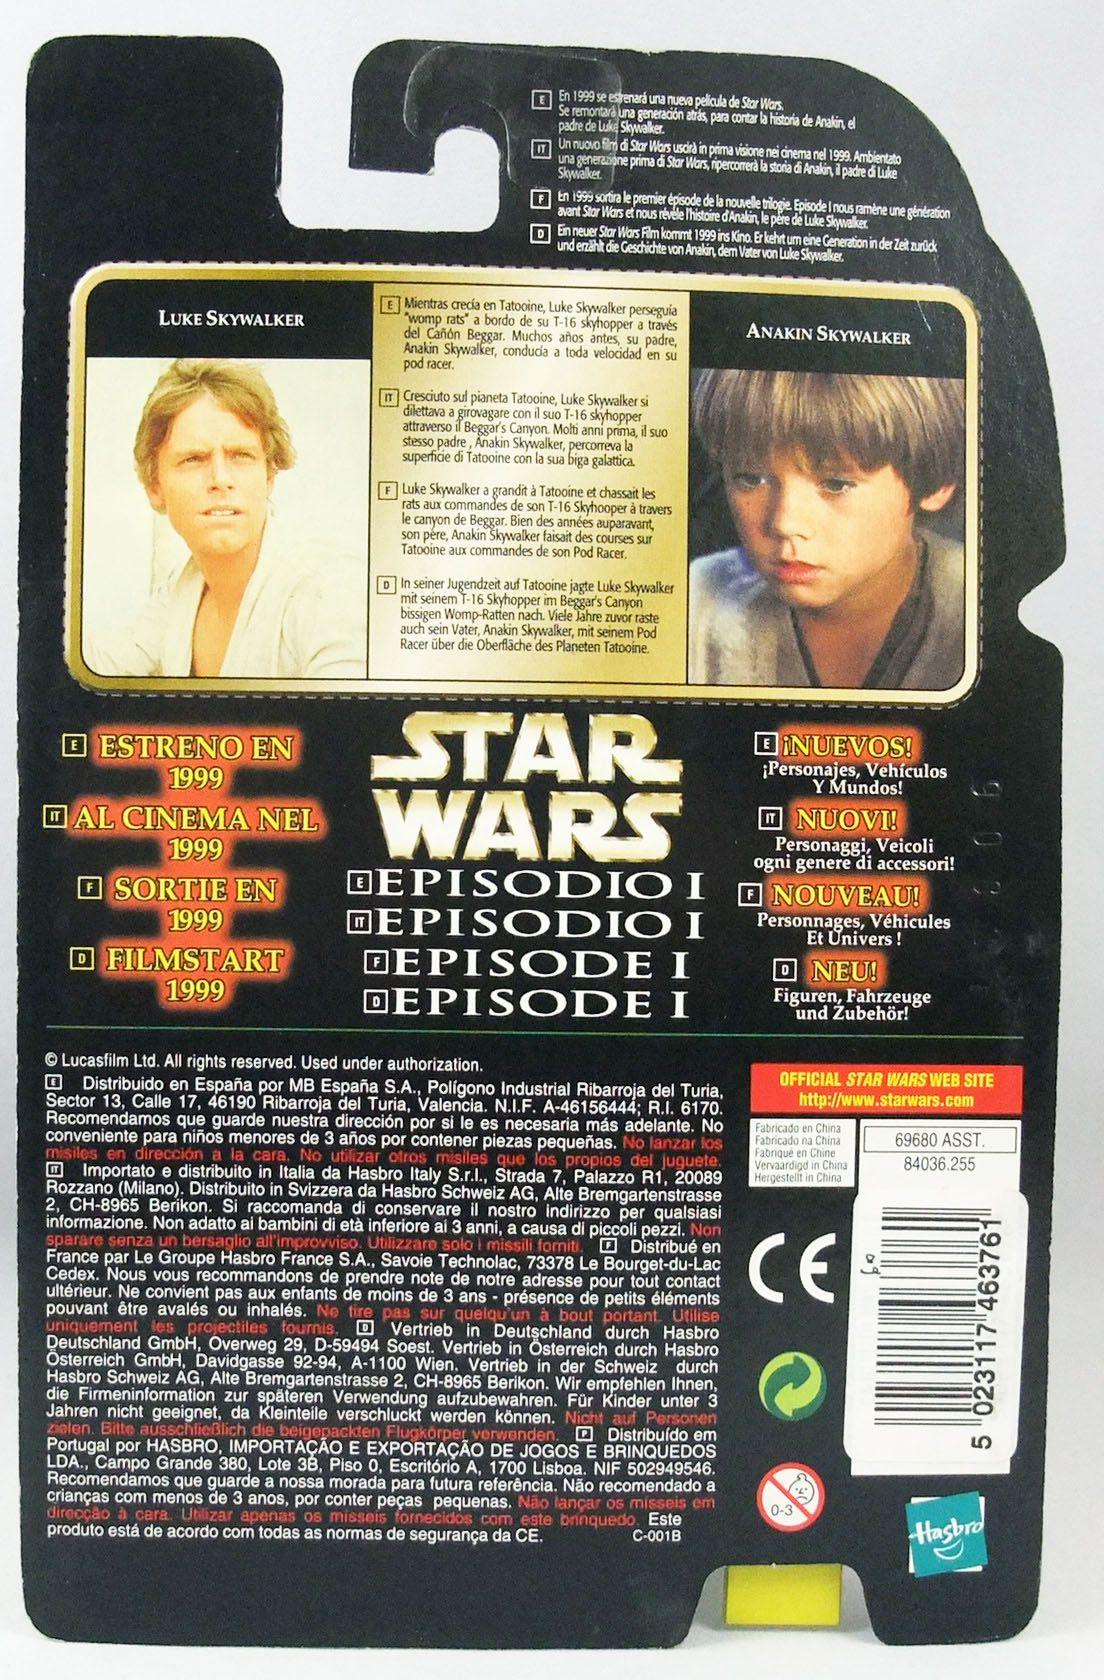 Star Wars (The Power of the Force) - Kenner - Luke Skywalker w/Blaster Rifle & Binoculars (Flashback)